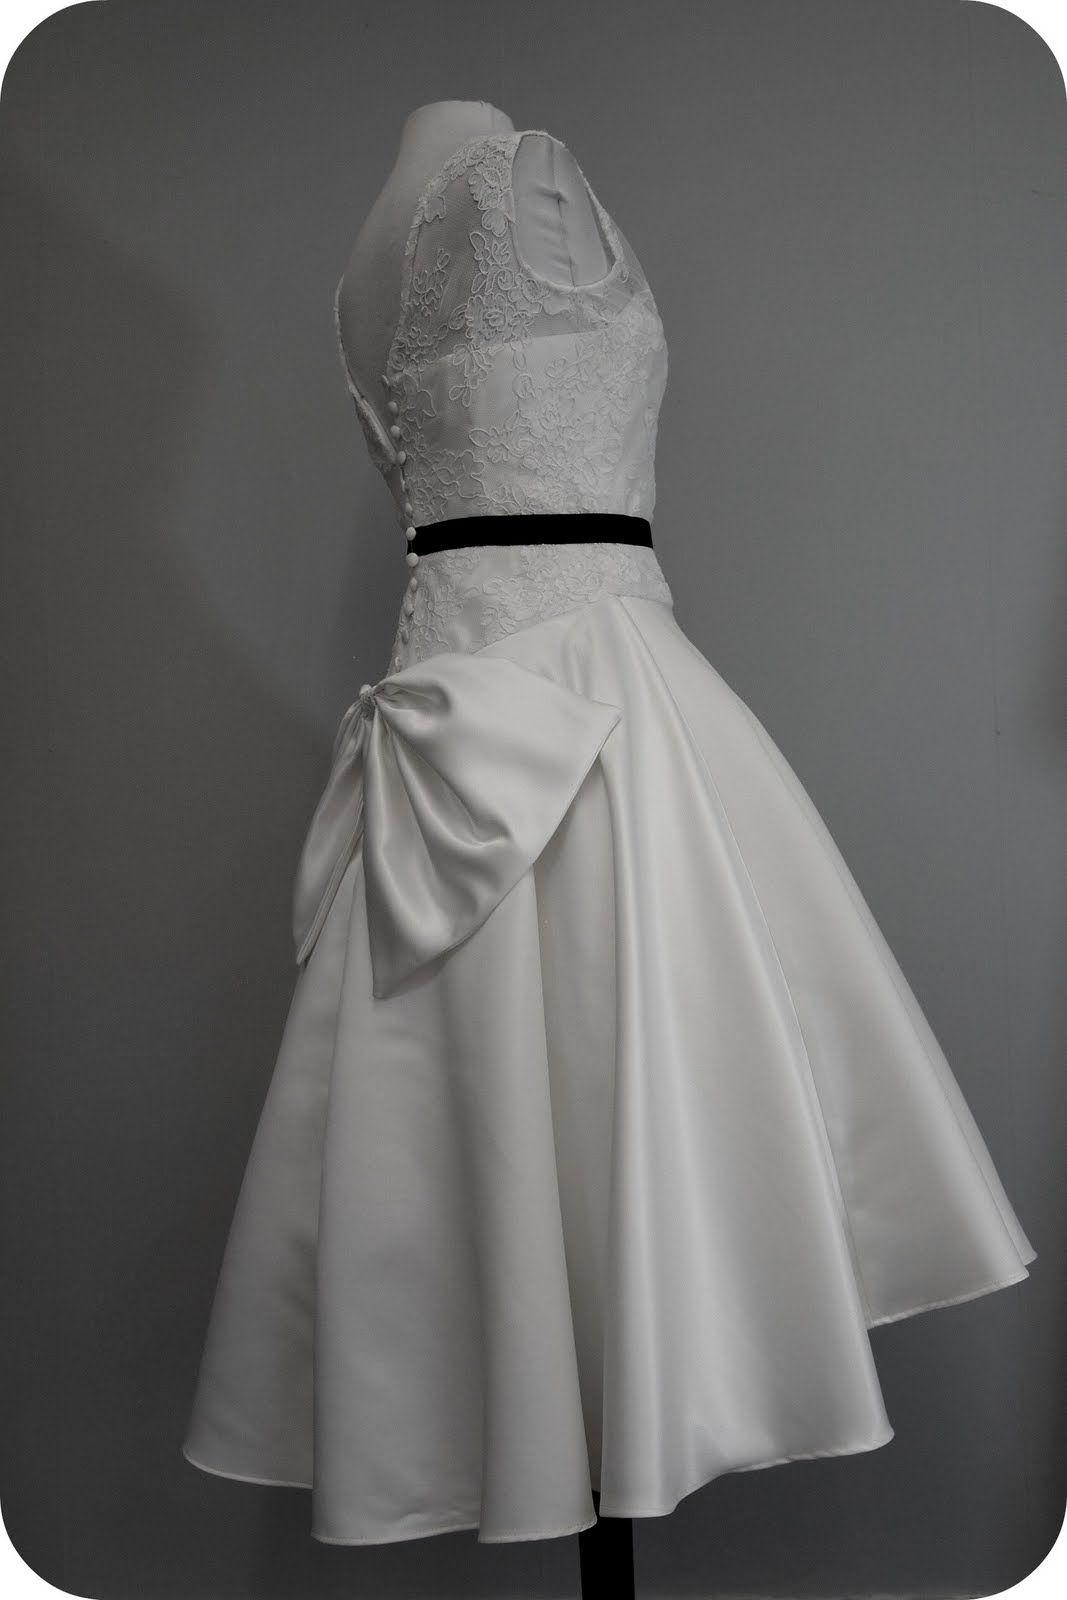 Wedding dress with bow on back  emmas fifties style bow back wedding dress  us  Glam u picsK